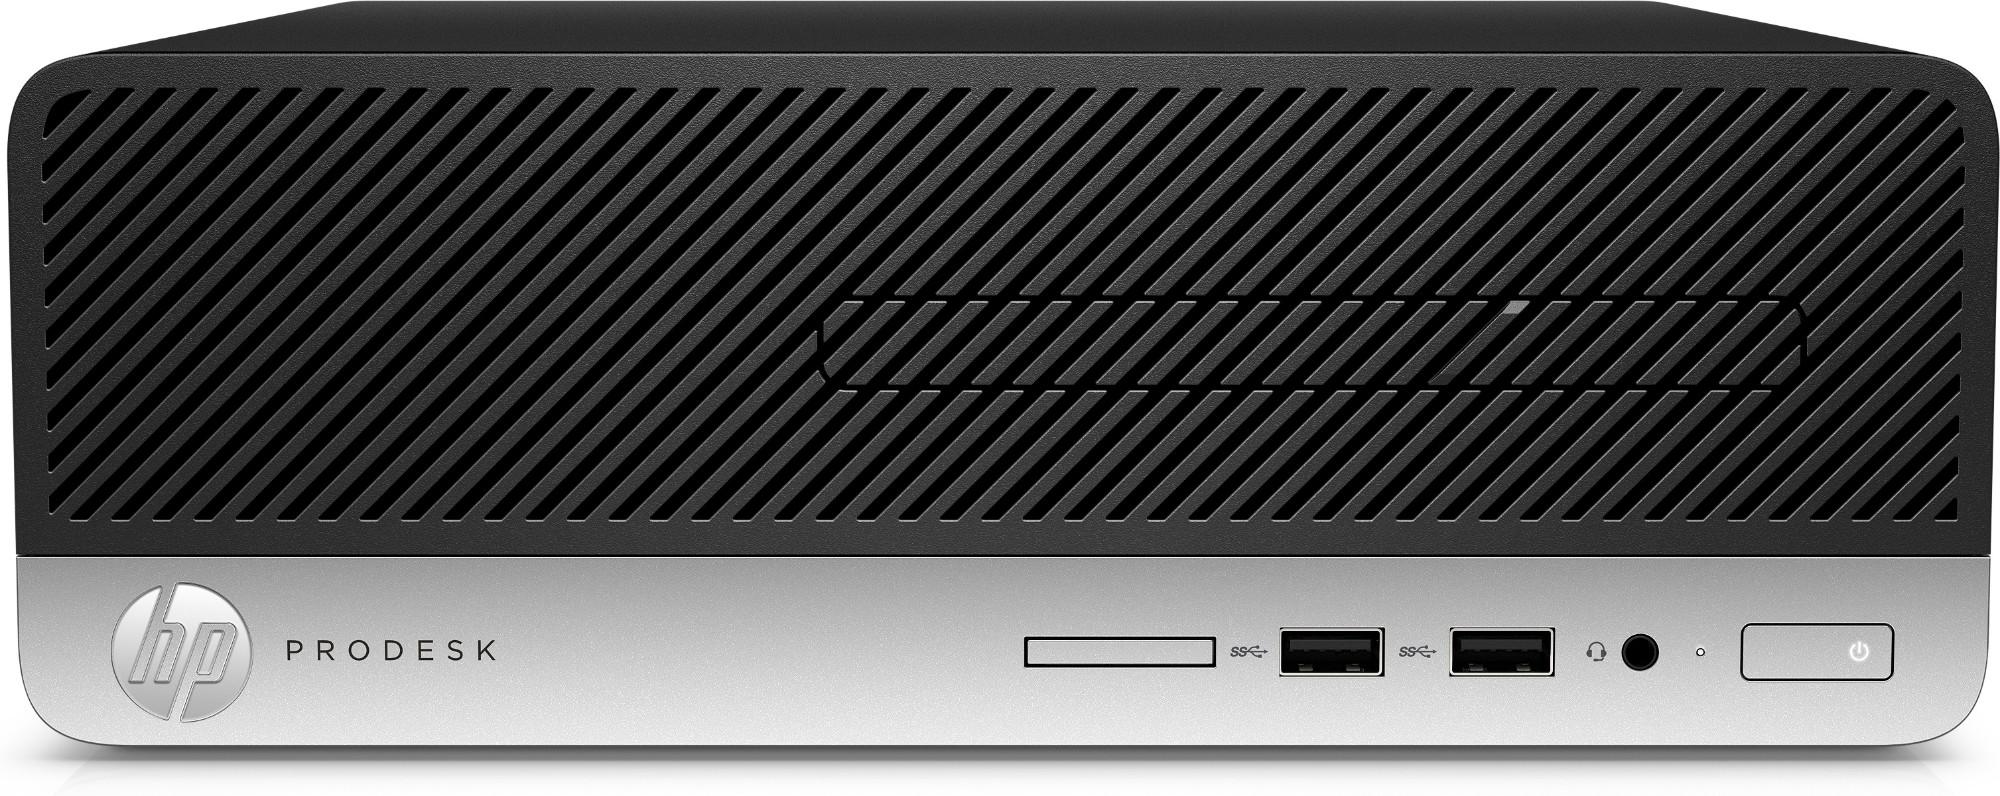 HP ProDesk 400 G6 9th gen Intel® Core™ i7 i7-9700 16 GB DDR4-SDRAM 512 GB SSD Black SFF PC